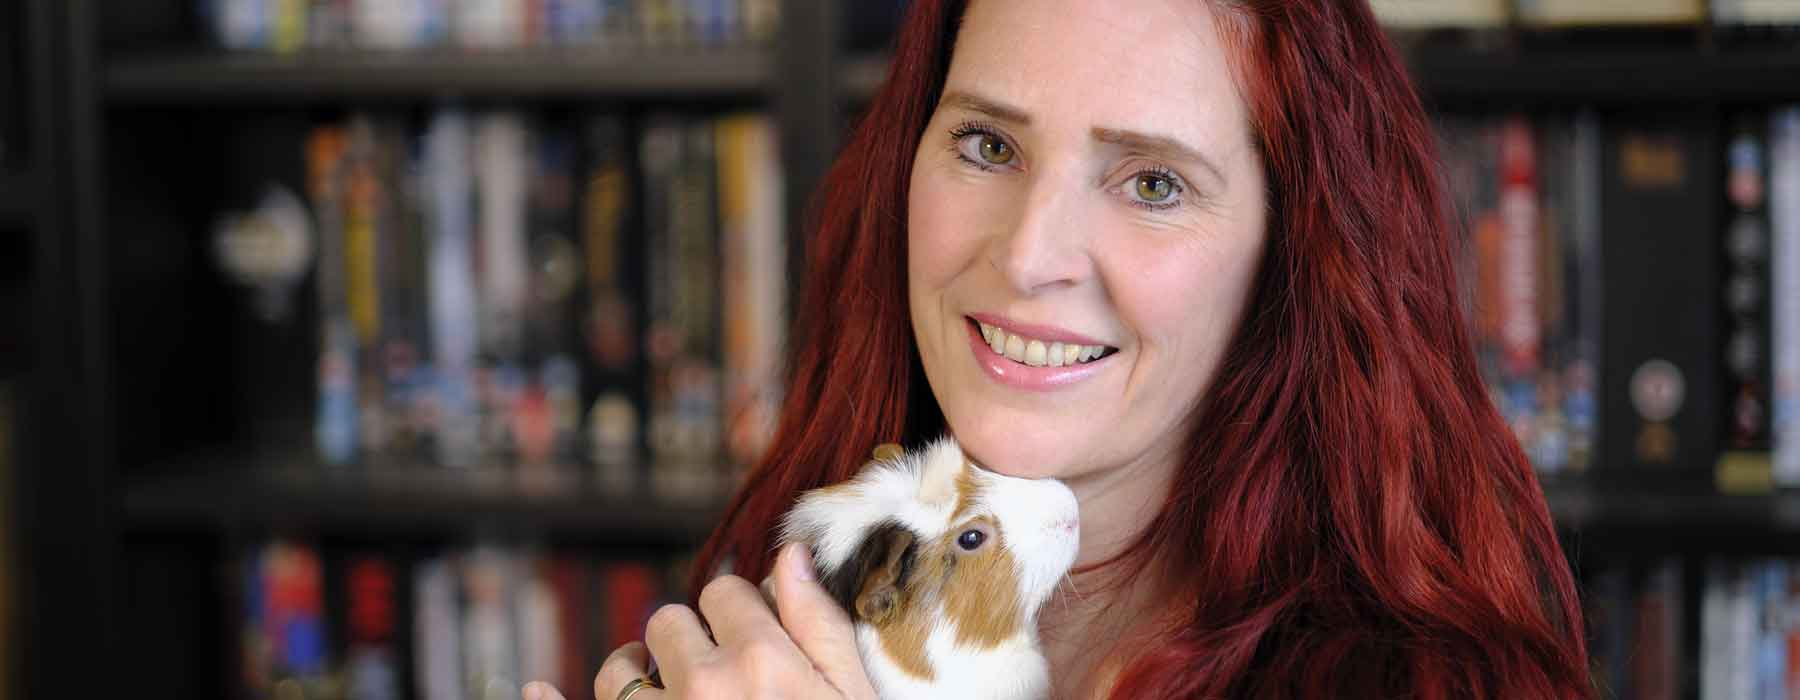 Monique- owner of Guinea Piggles with Mr Jaffas the Guinea Pig